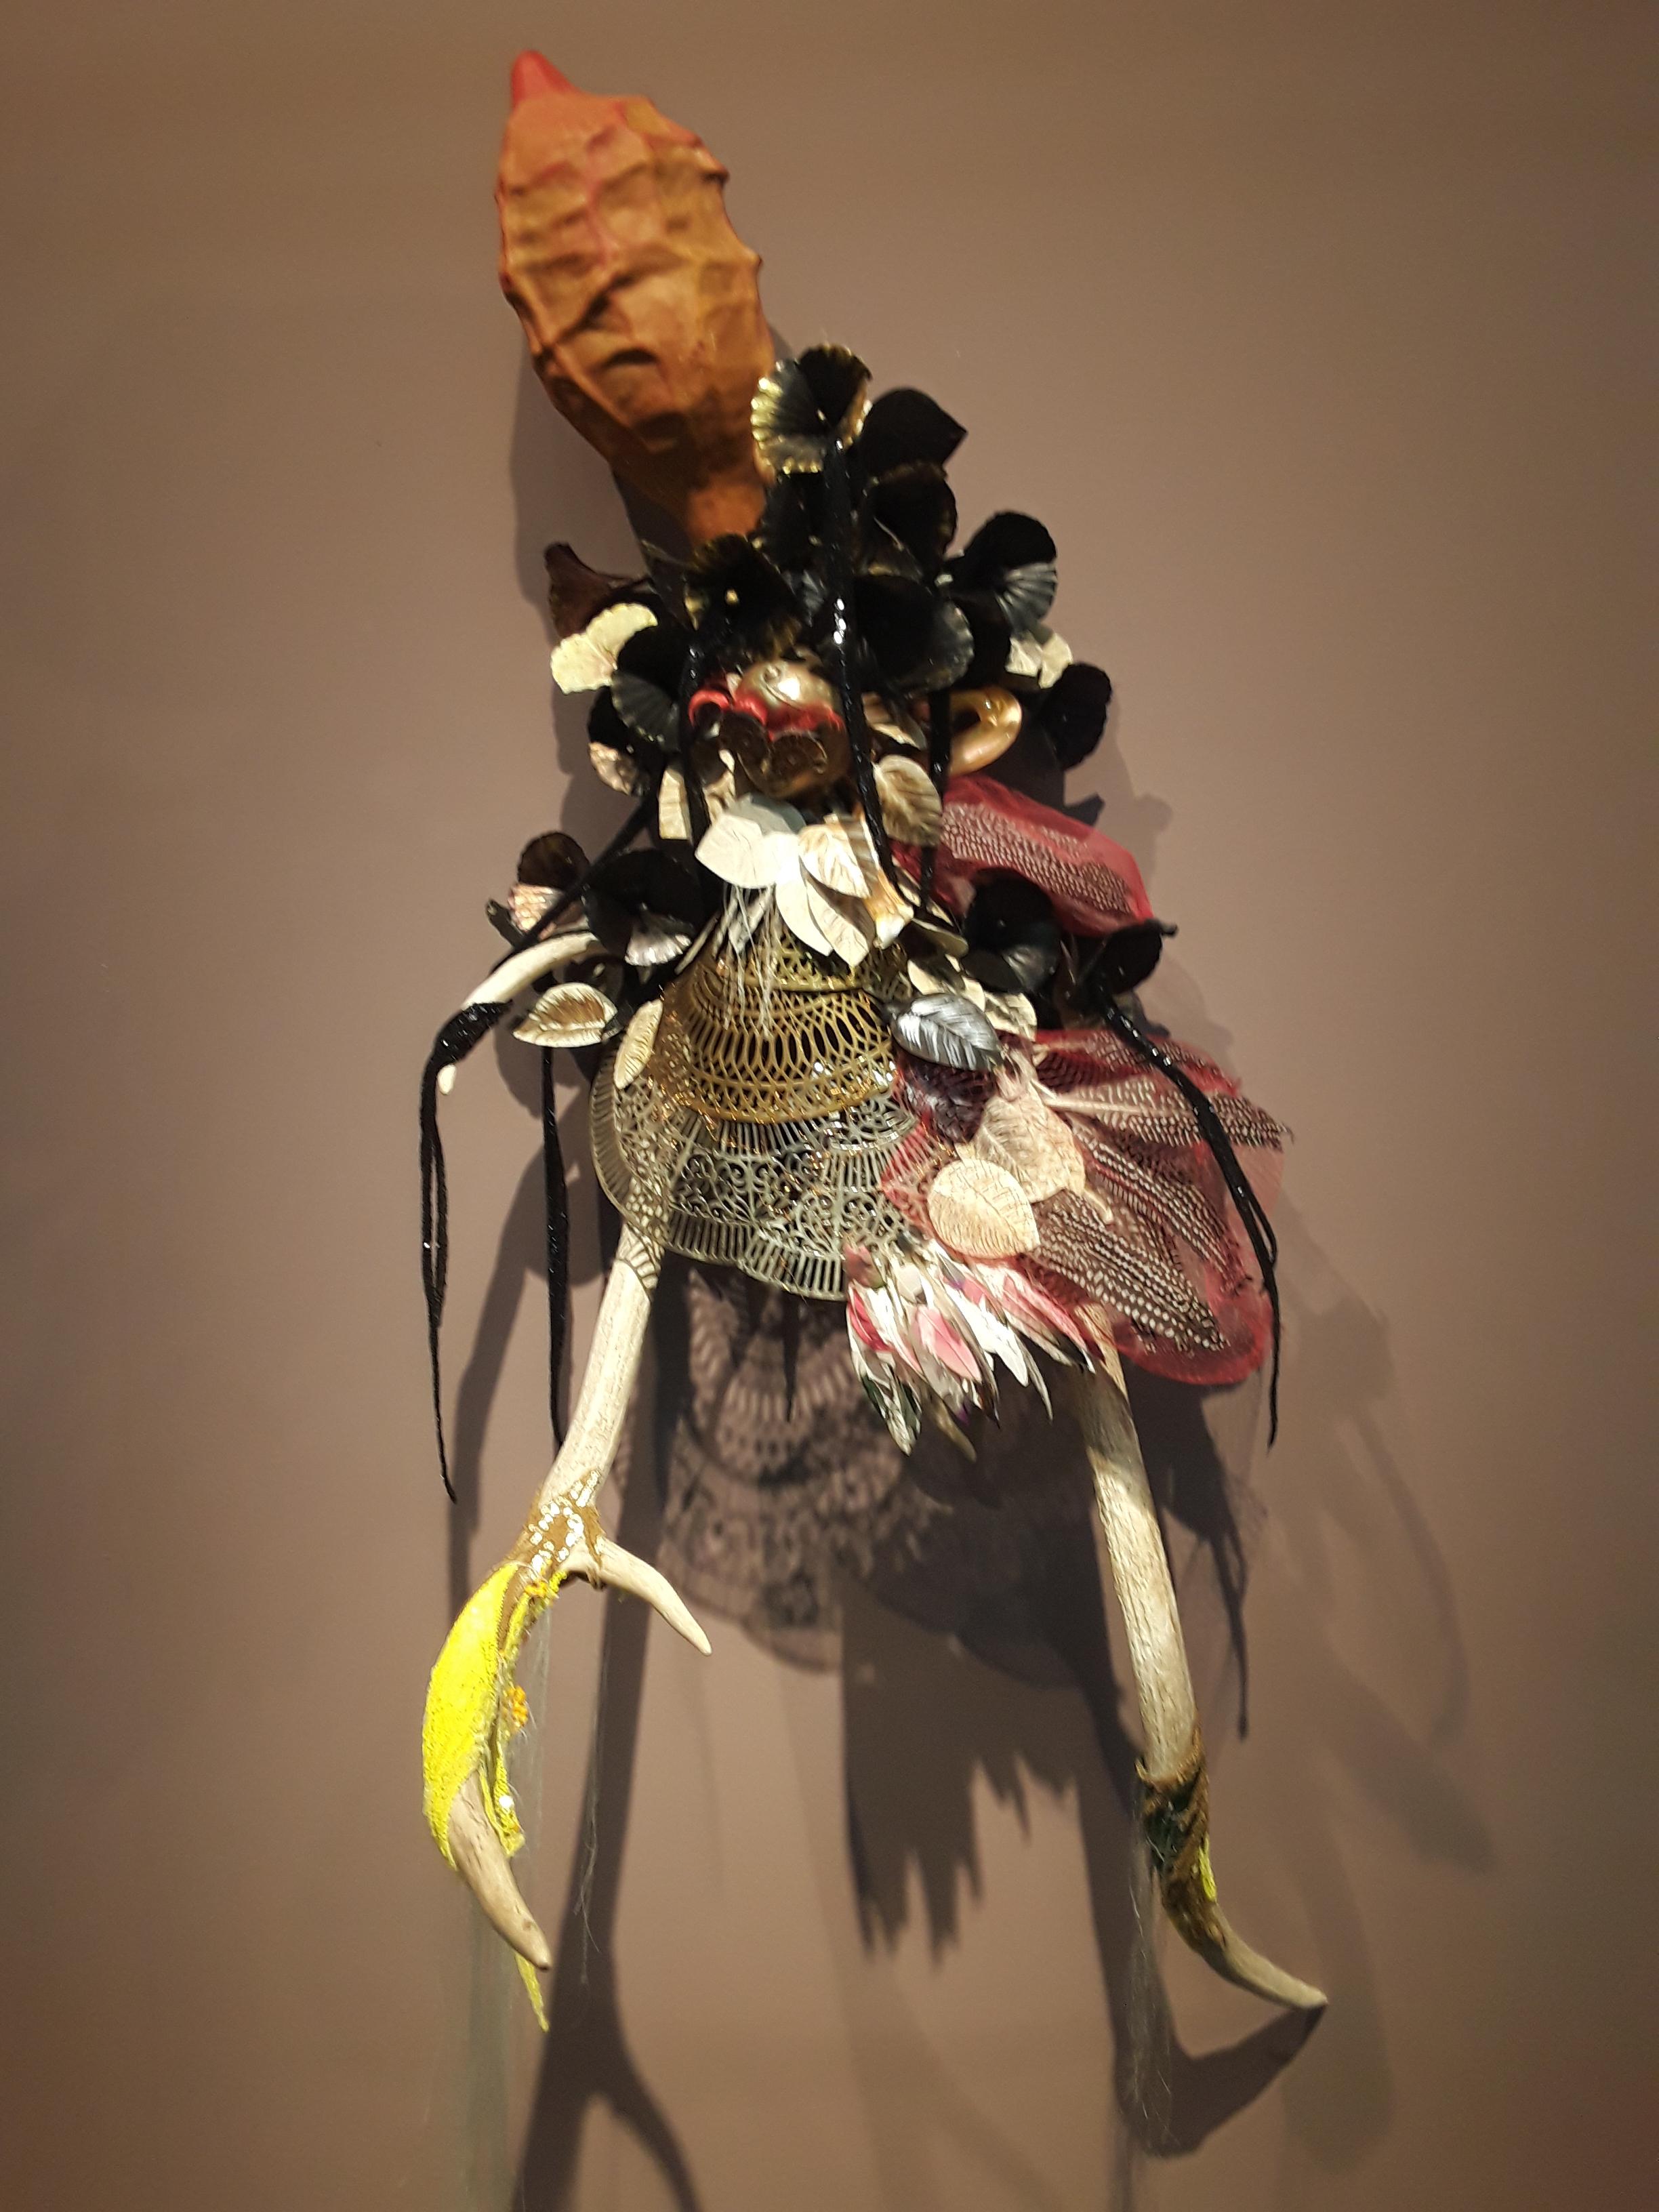 Rina Banerjee, 2020, installation view. Galerie Nathalie Obadia.